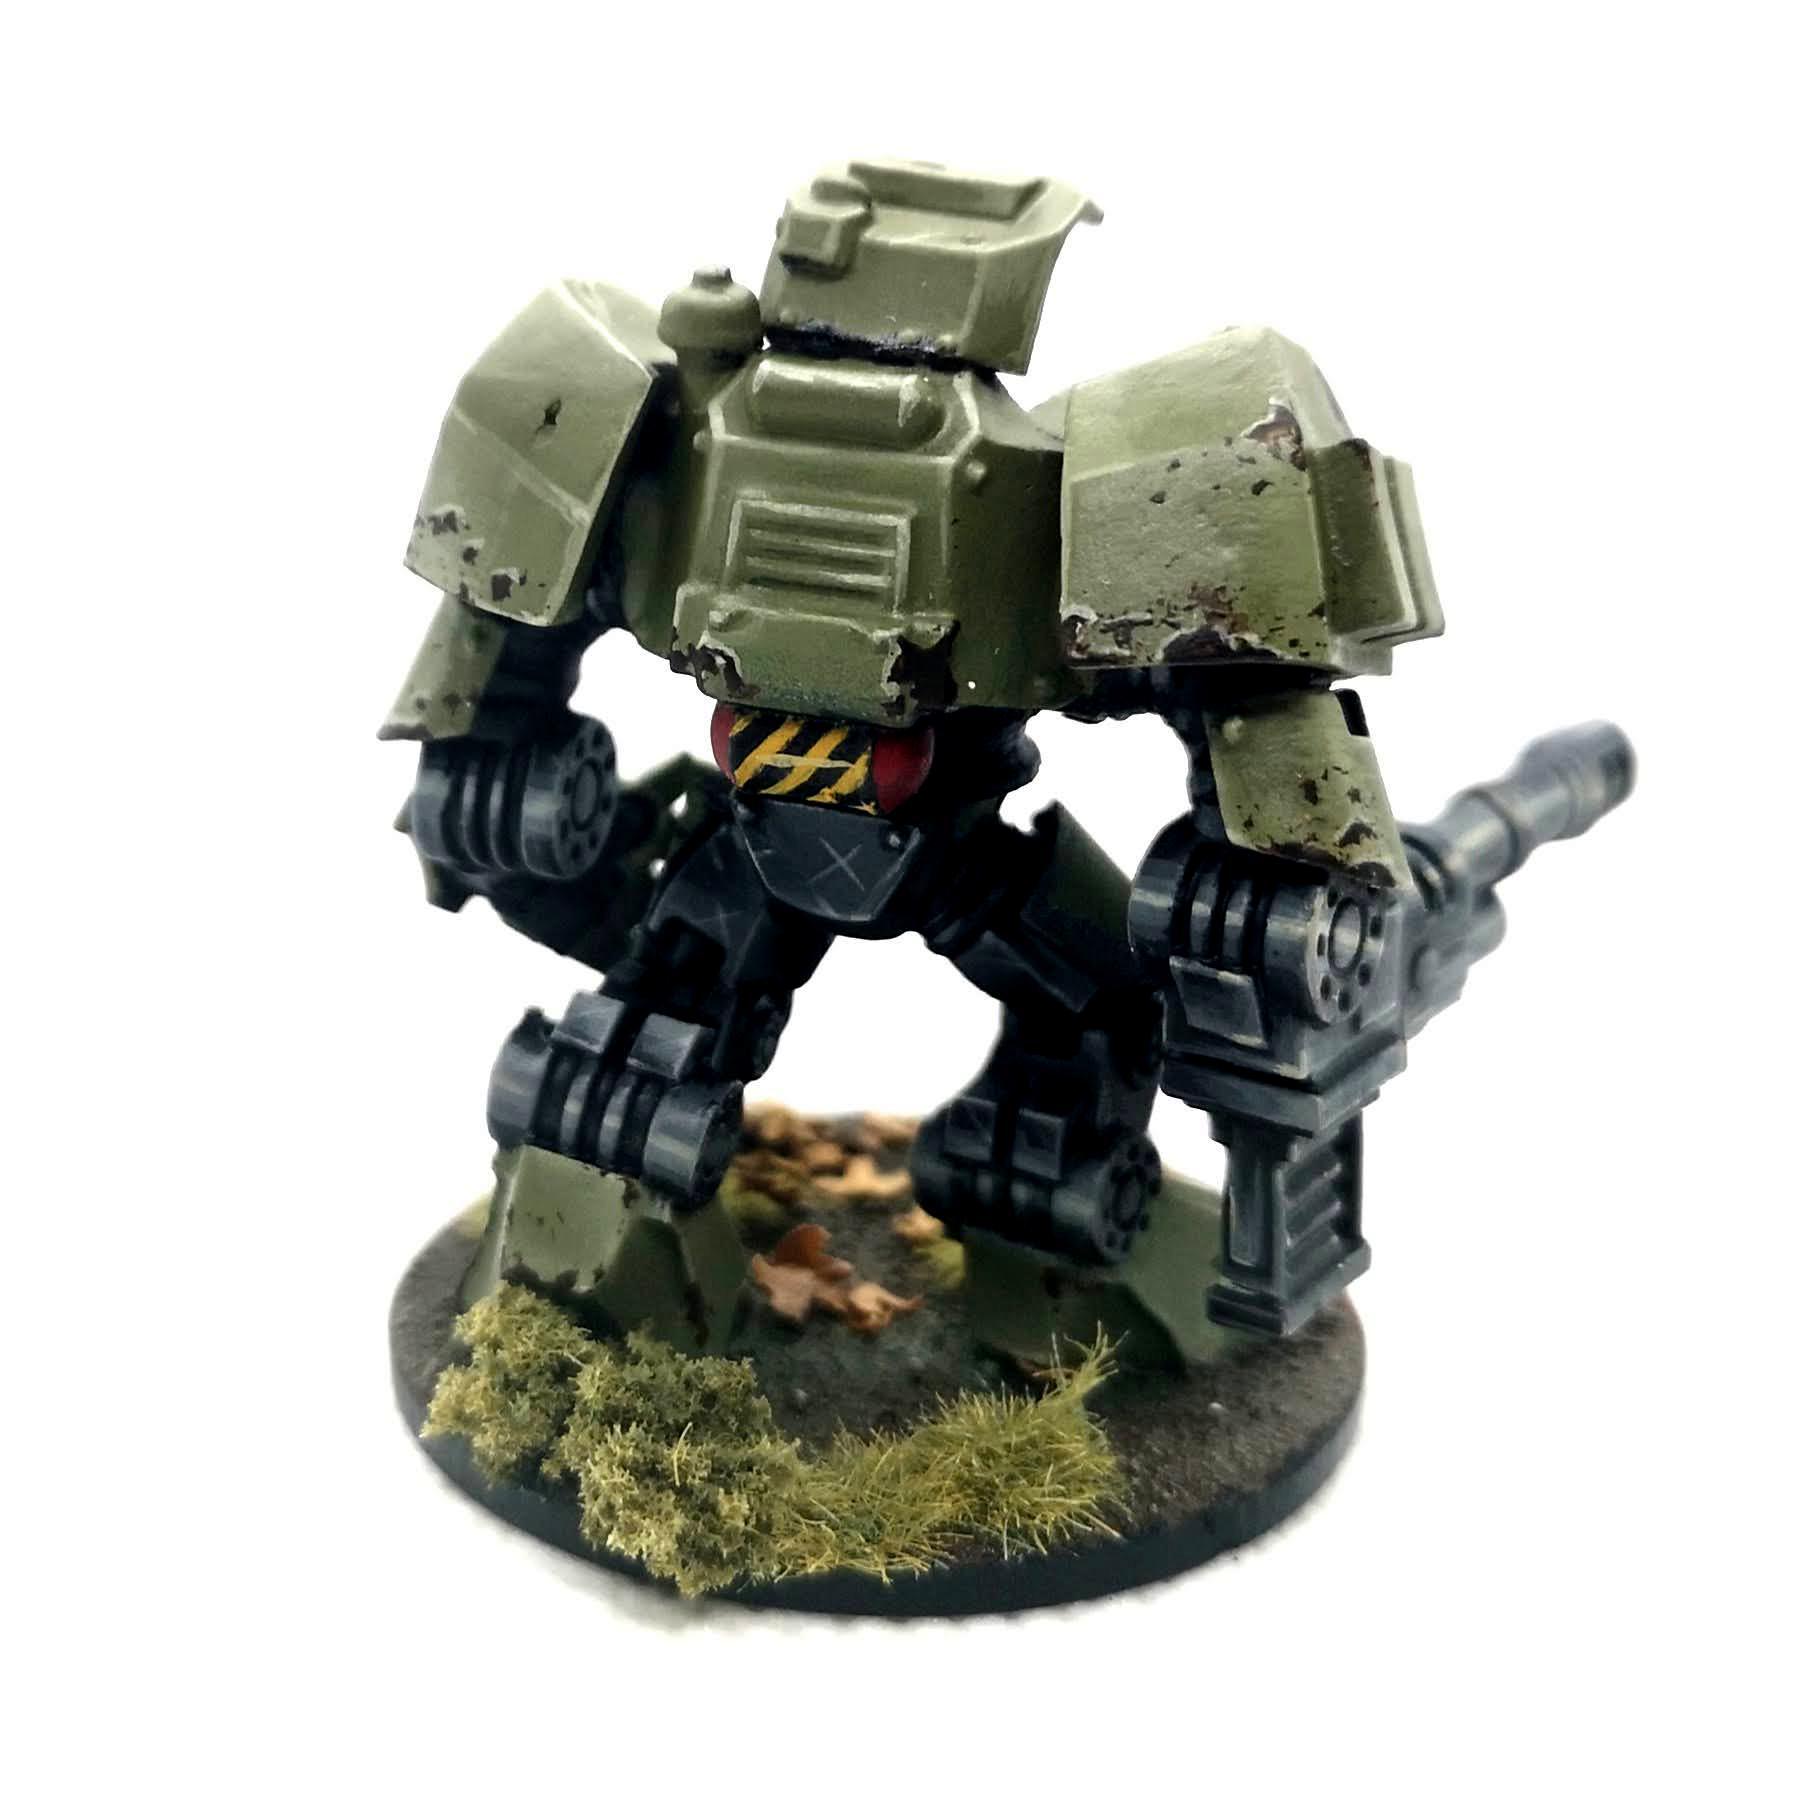 Bulldog, Horizon Wars, Imef, Power Armour, Precinct Omega, Precinctomega, Reaper, Zero Dark